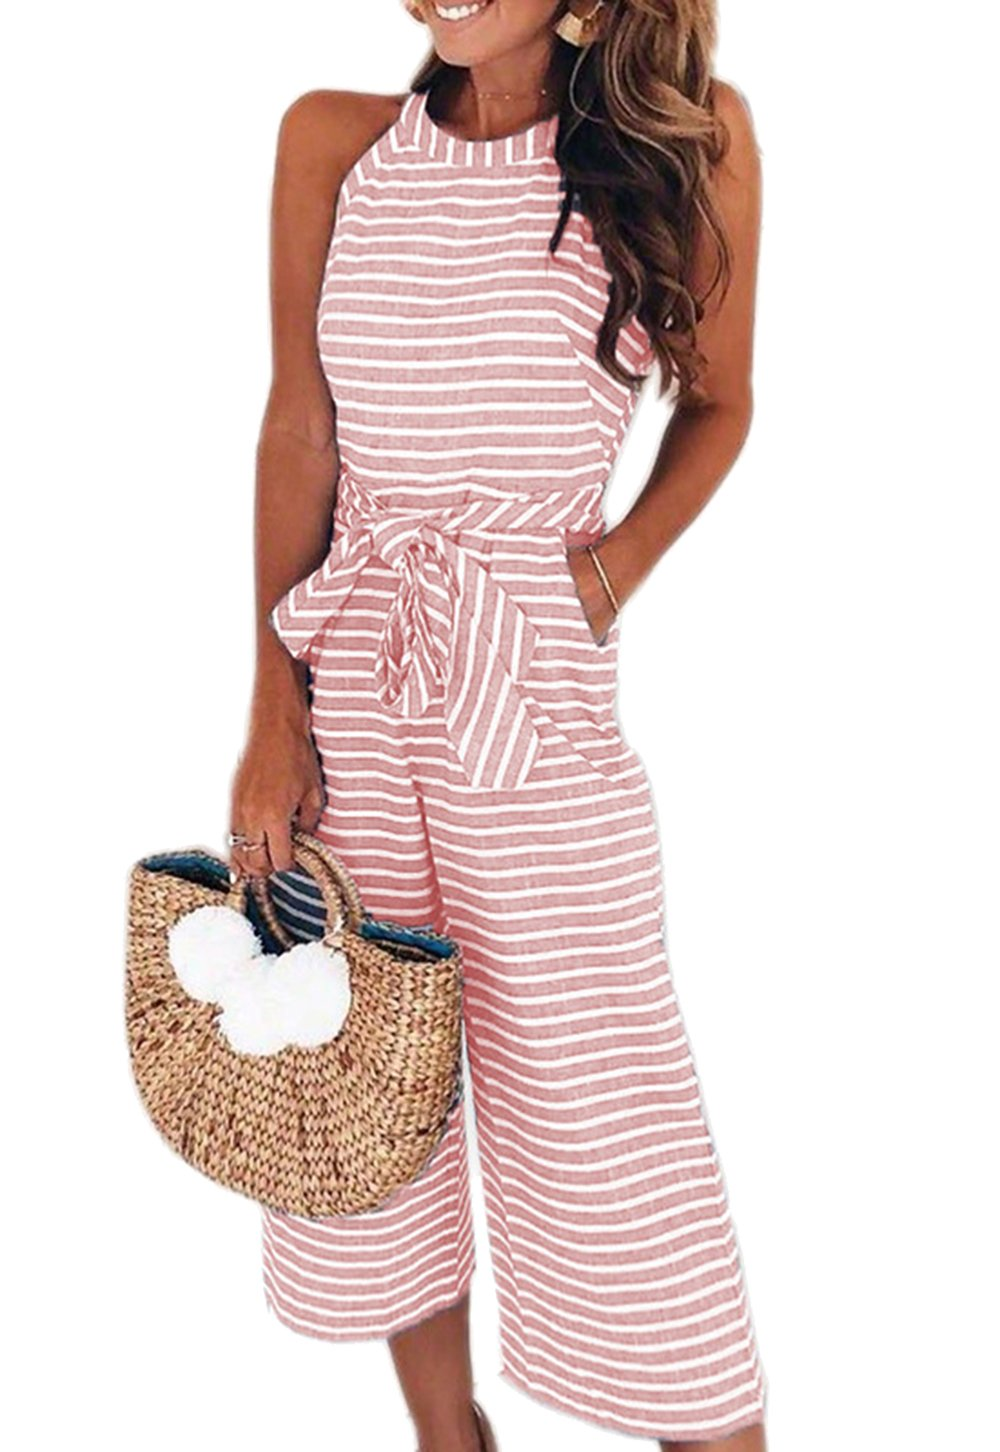 PRETTYGARDEN 2018 Women's Striped Sleeveless Waist Belted Zipper Back Wide Leg Loose Jumpsuit Romper with Pockets (Pink, X-Large) by PRETTYGARDEN (Image #1)